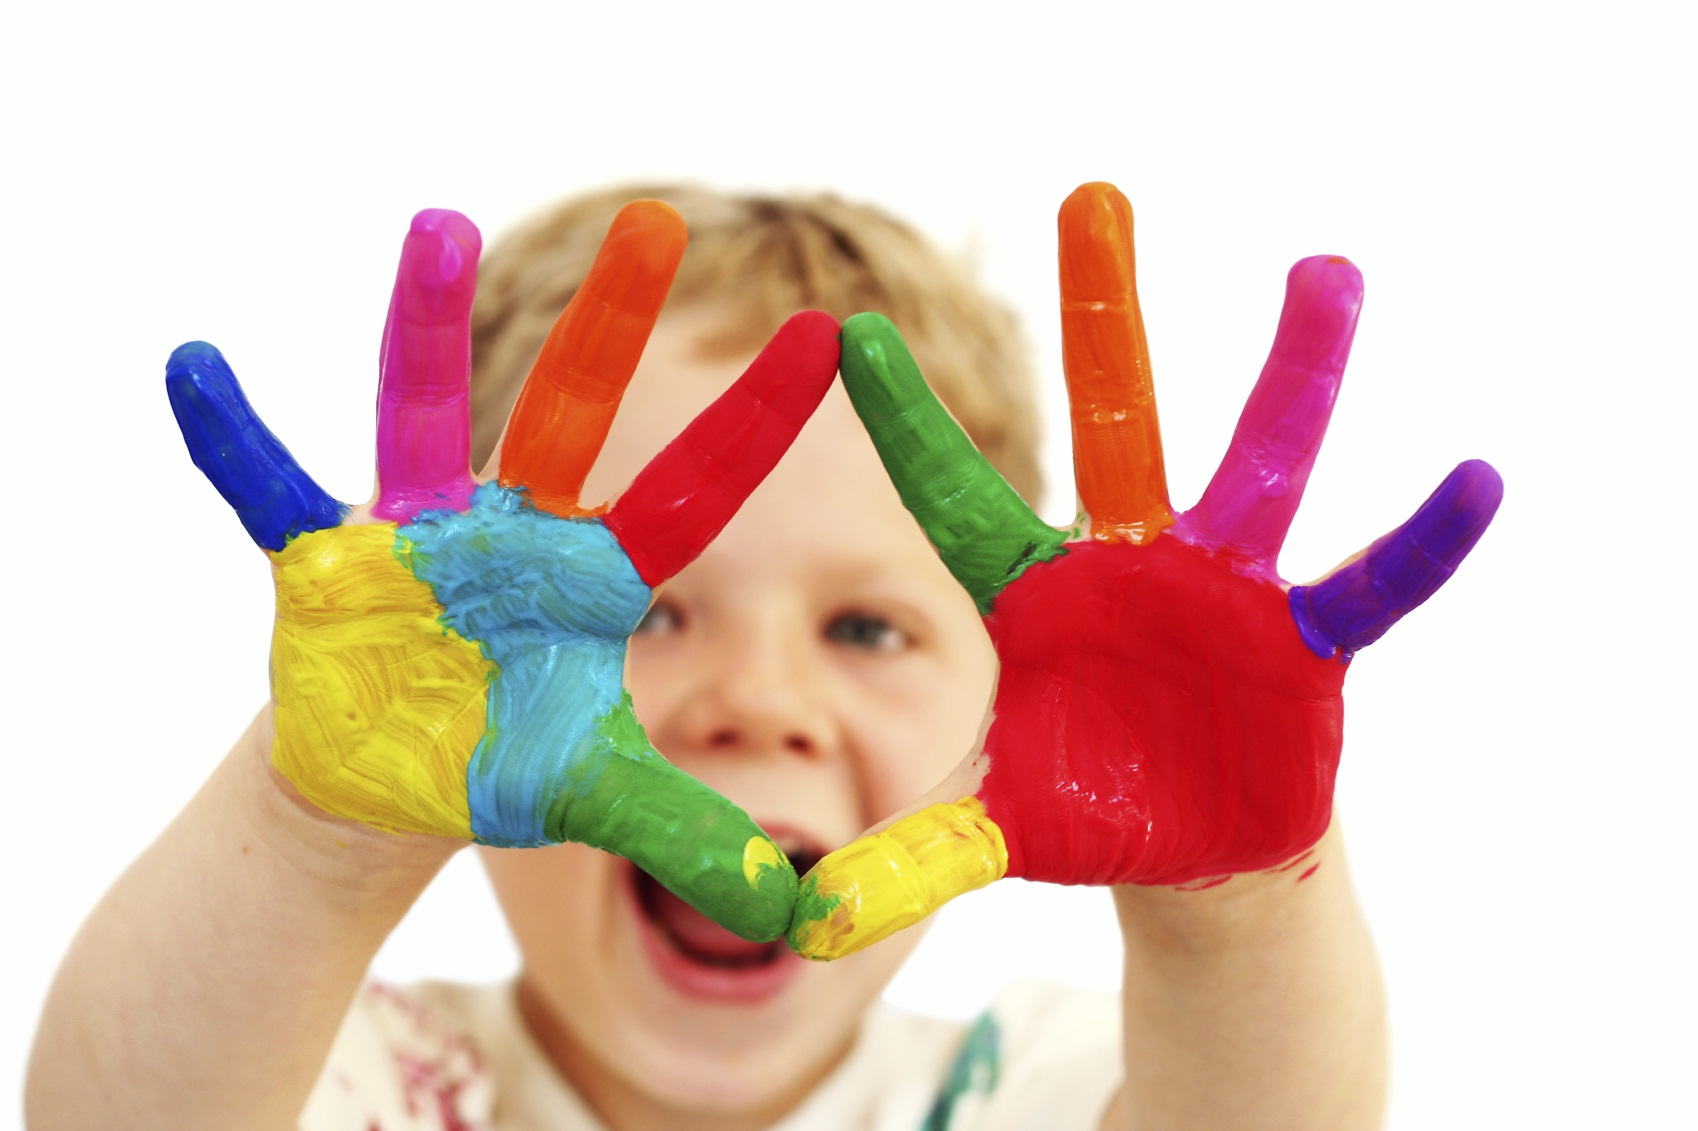 happy child with painted hands kansai scene magazine